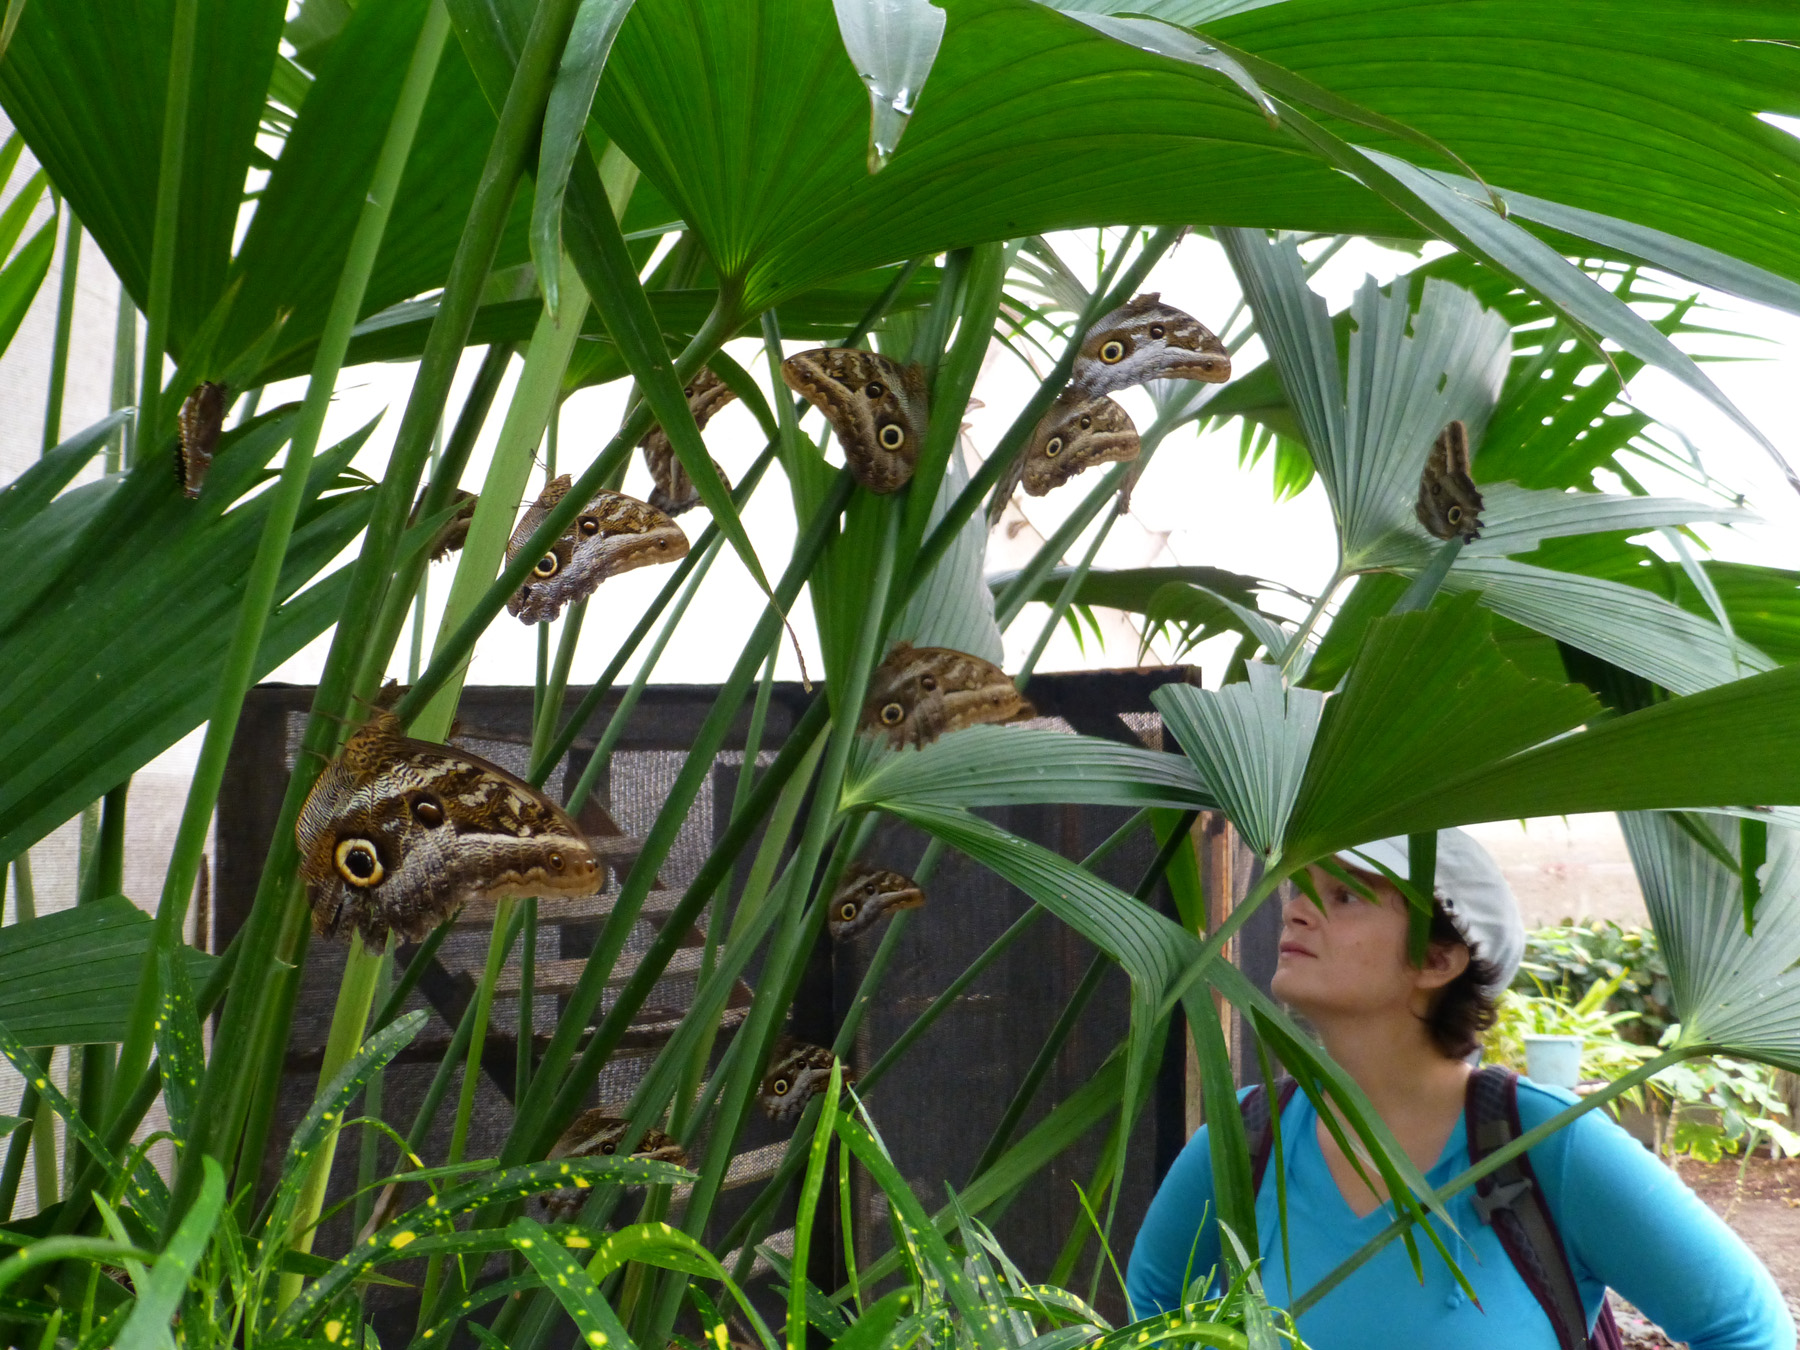 Owl's eye butterflies filling a tree in the Mariposario.